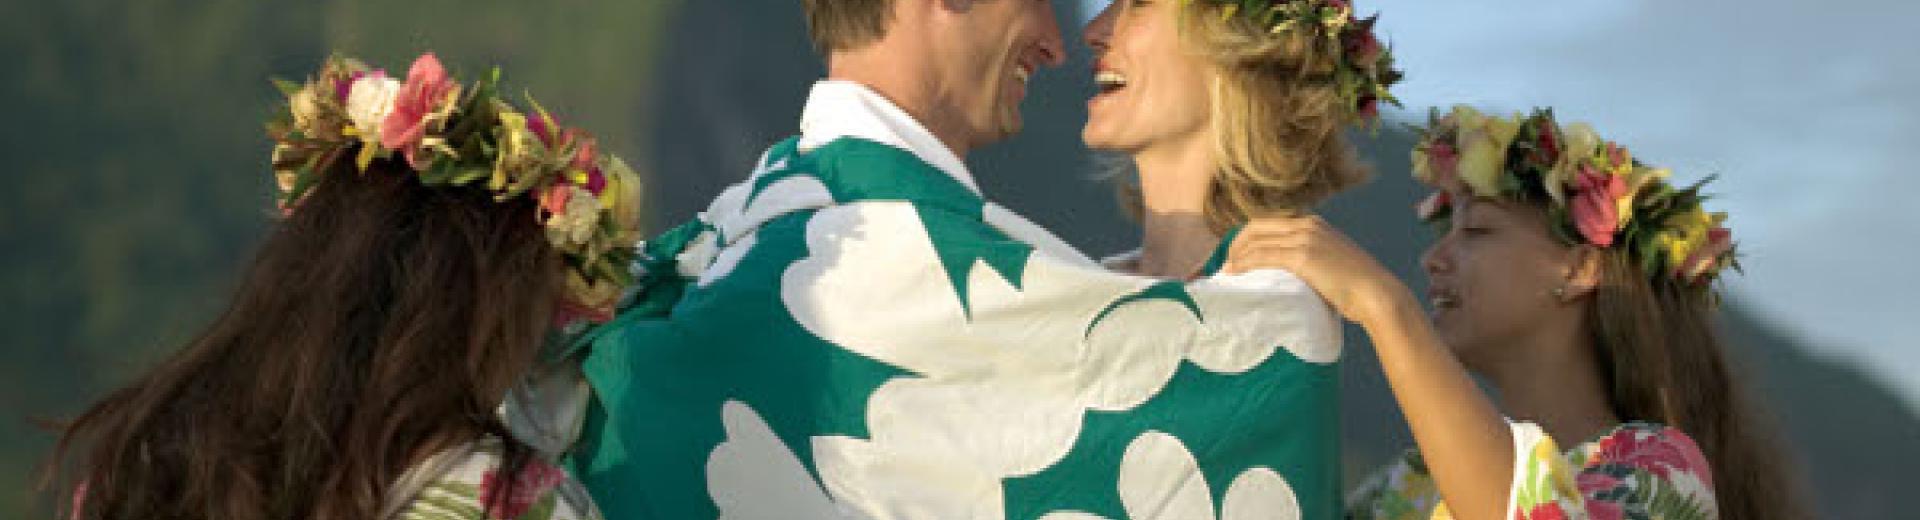 paul gaugin cruise wedding cloth